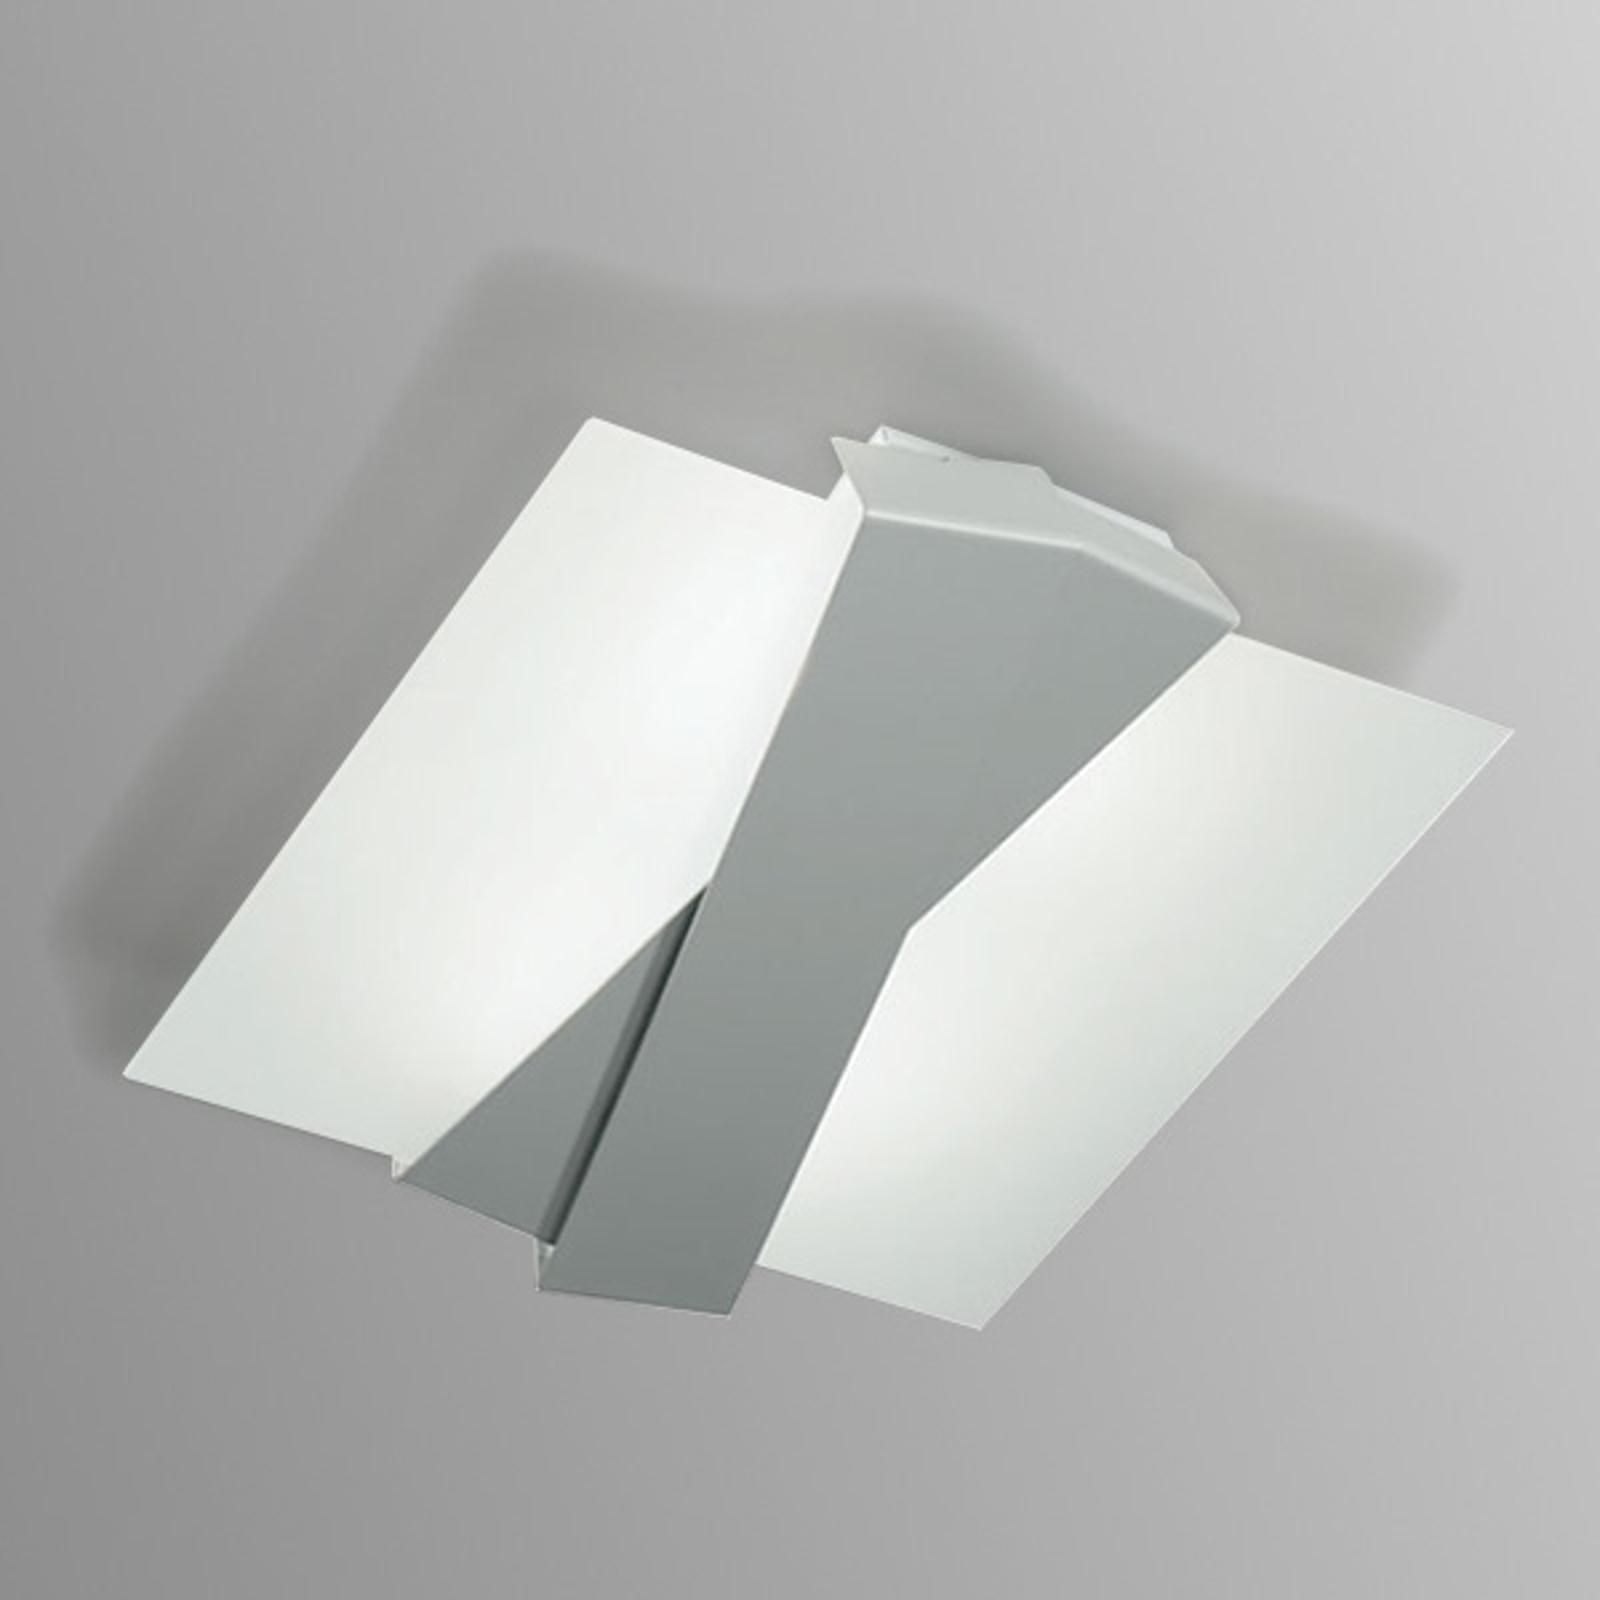 Plafonnier moderne ZIG ZAG aluminium